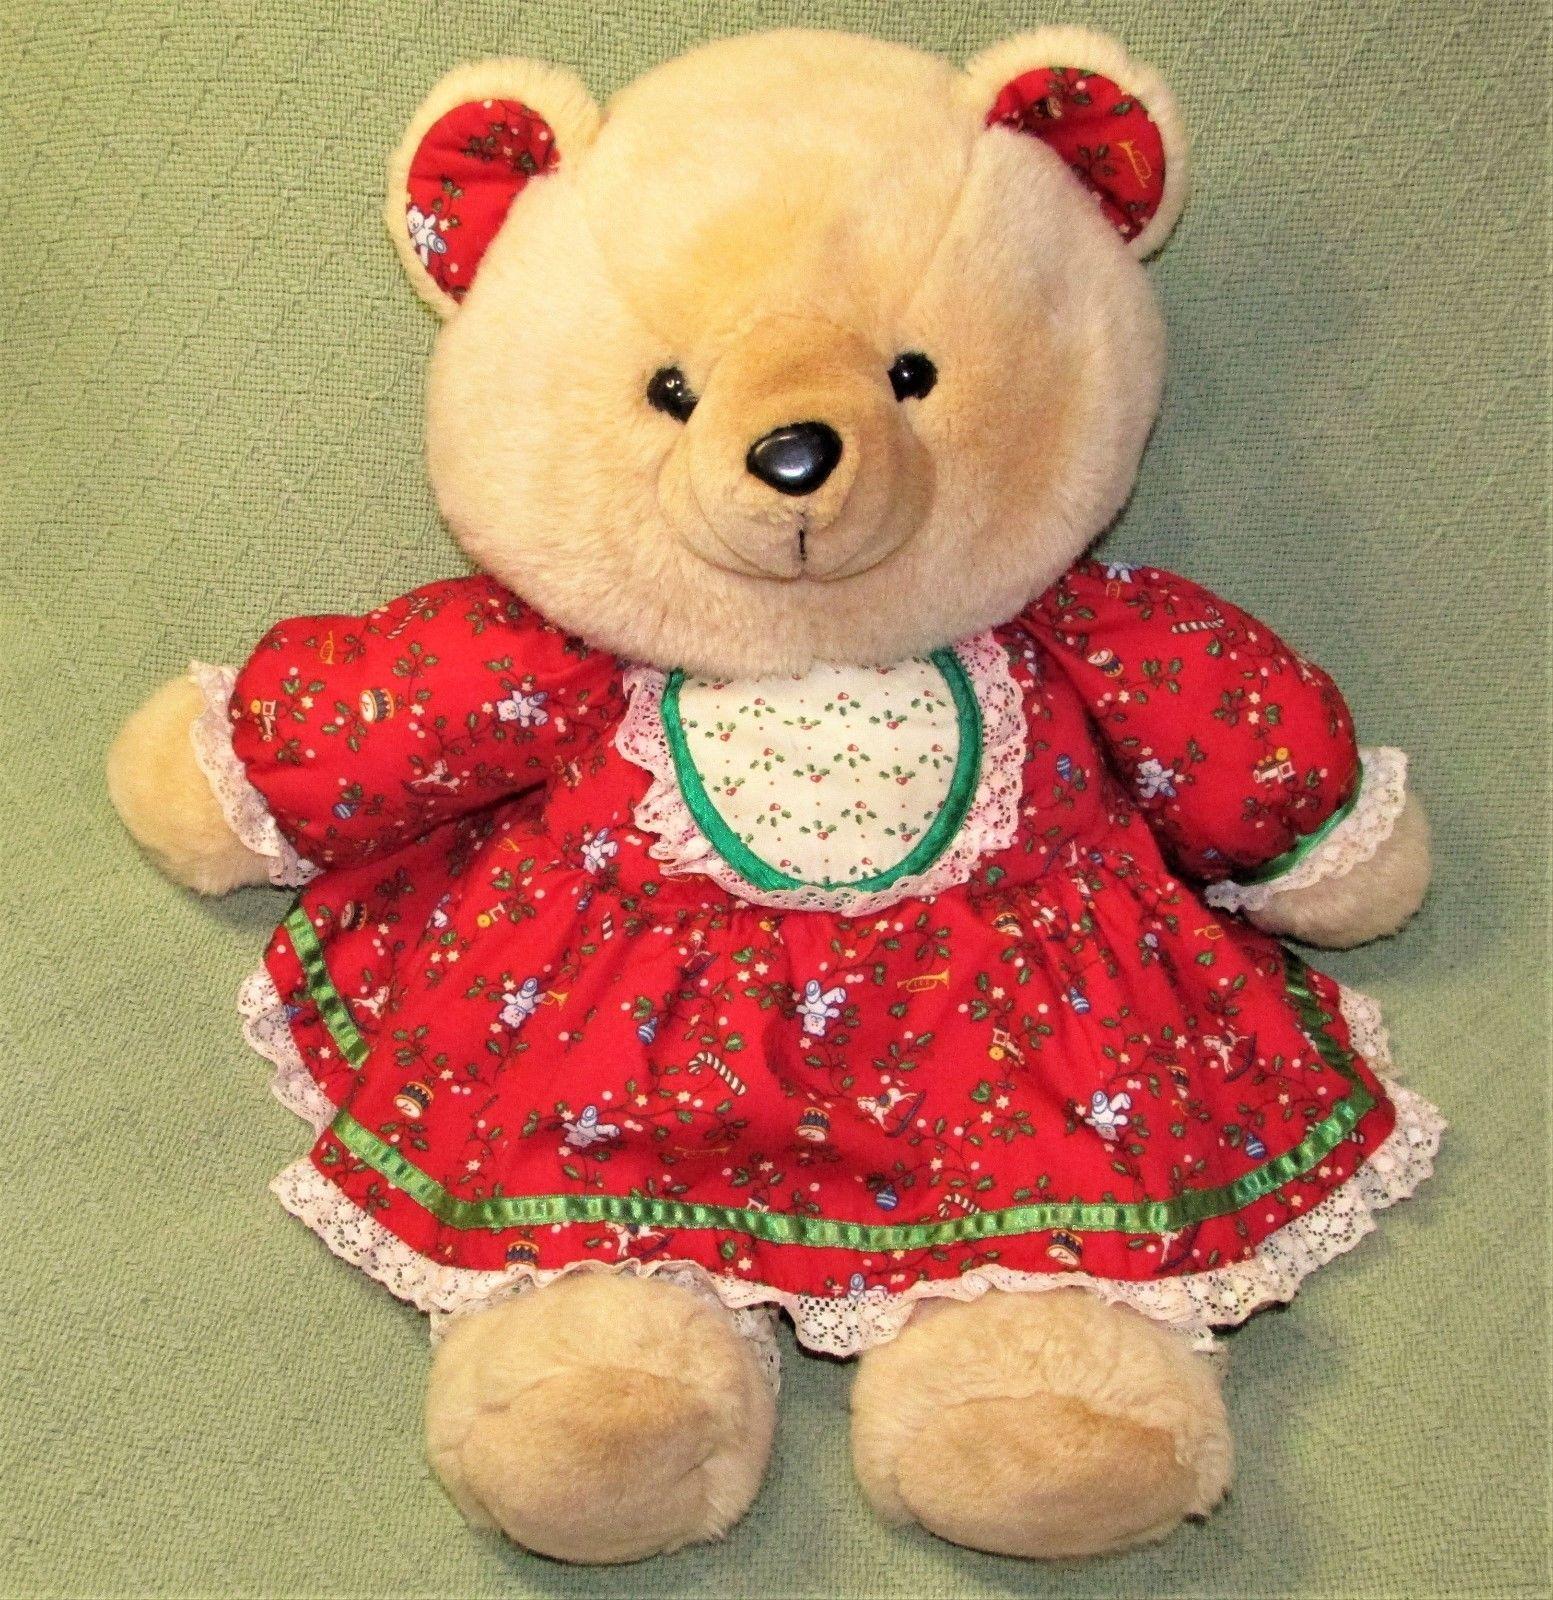 Kmart Plush Doll (1980s): 7 listings